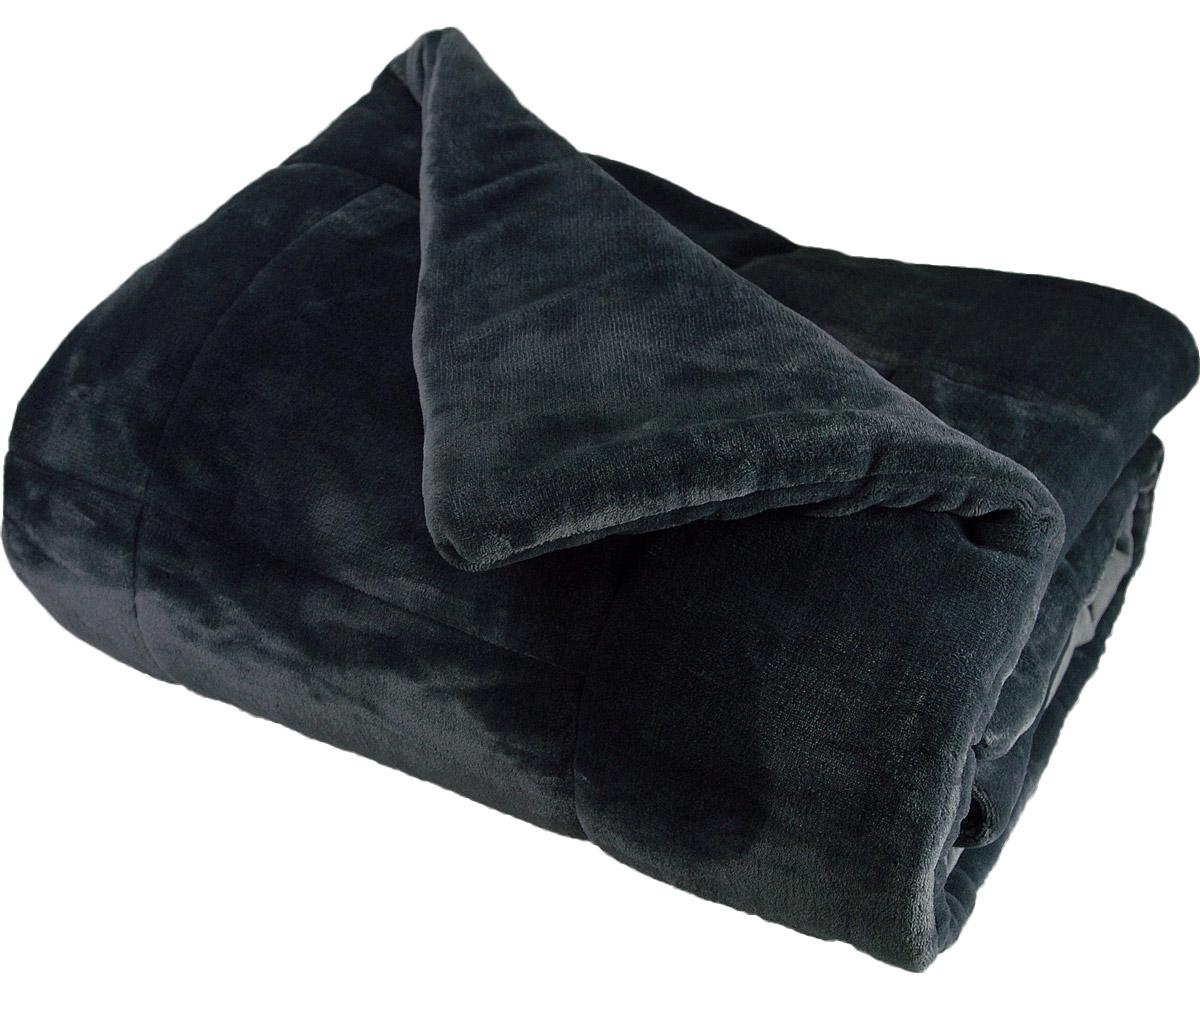 couvre lit matelass douceur polaire silver grey indigo ficelle rubis homemaison. Black Bedroom Furniture Sets. Home Design Ideas